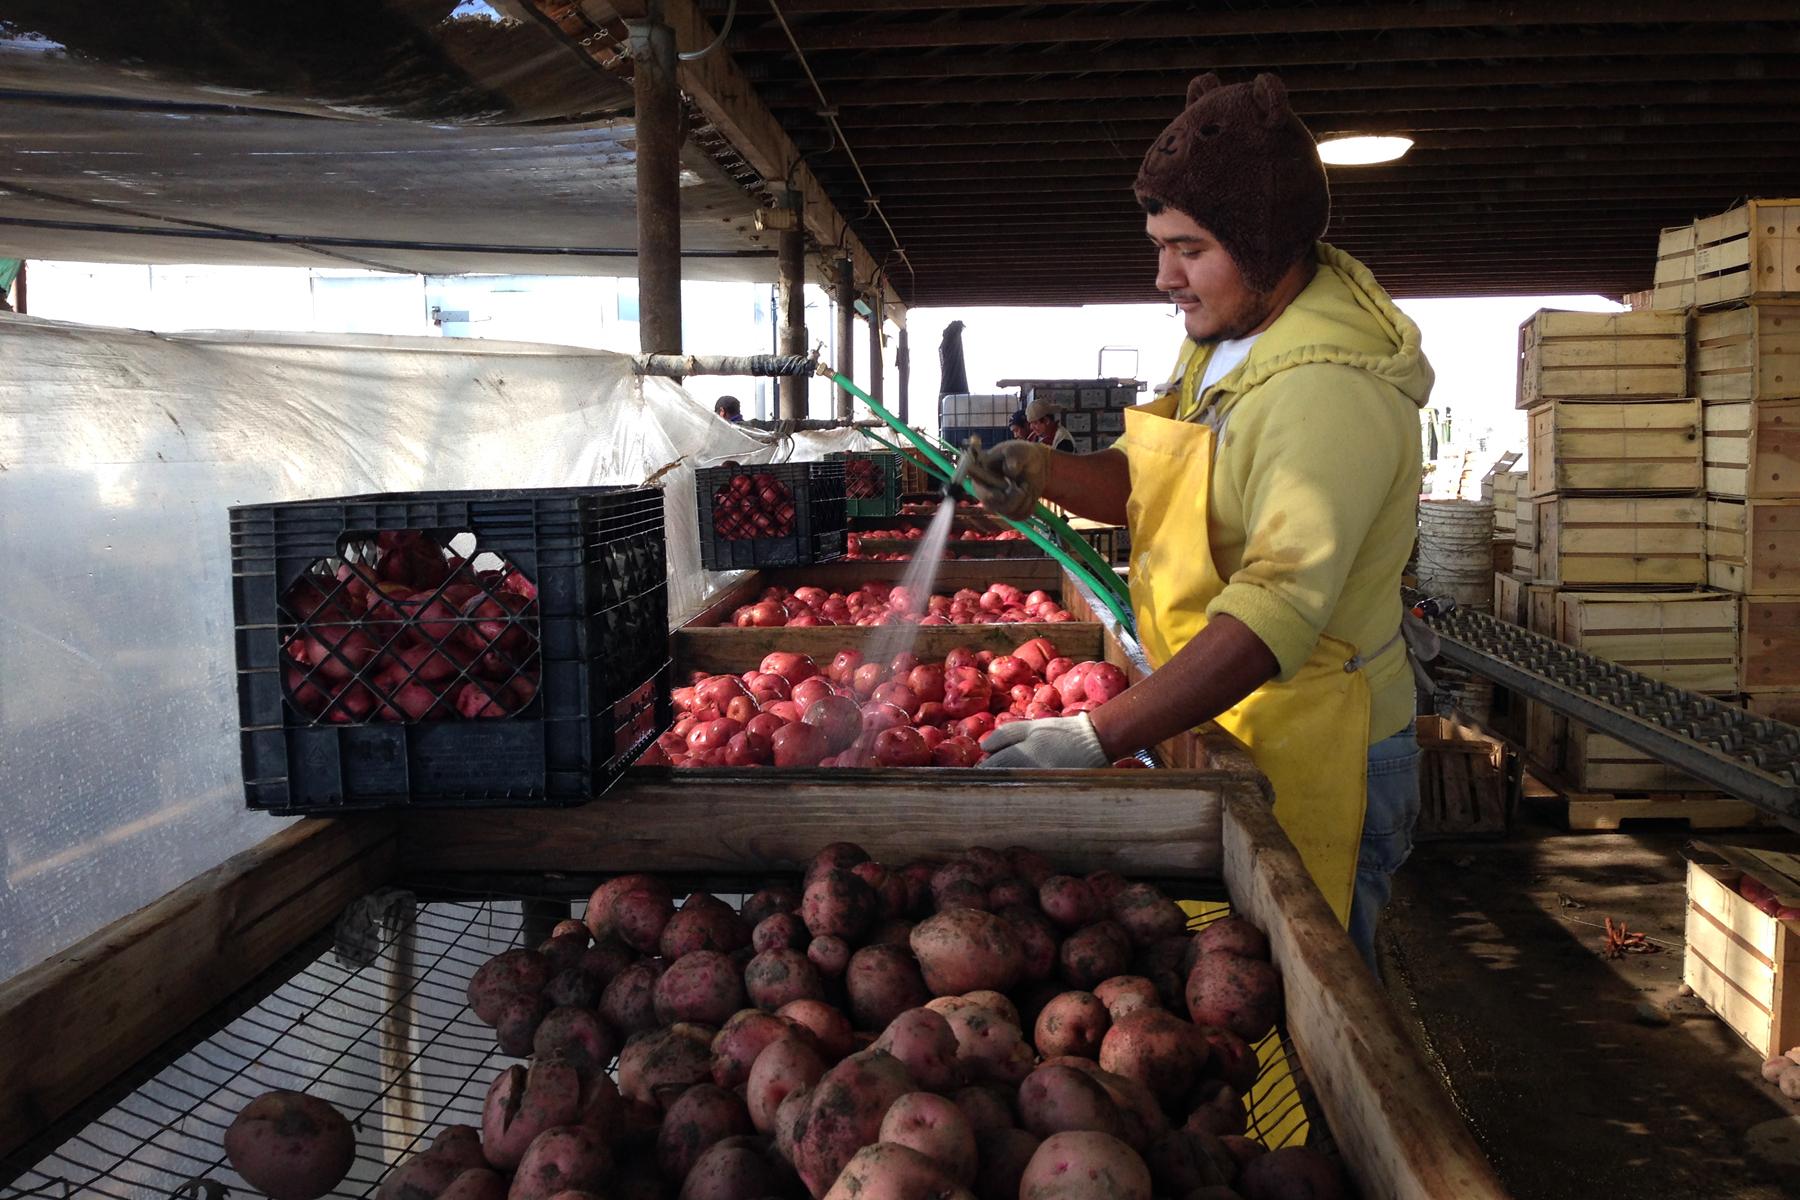 Nahun Villagomez Sanchez washes freshly dug Red LaSoda potatoes at T&D Willey Farms near Madera, Calif. Photo: Dan Charles/NPR